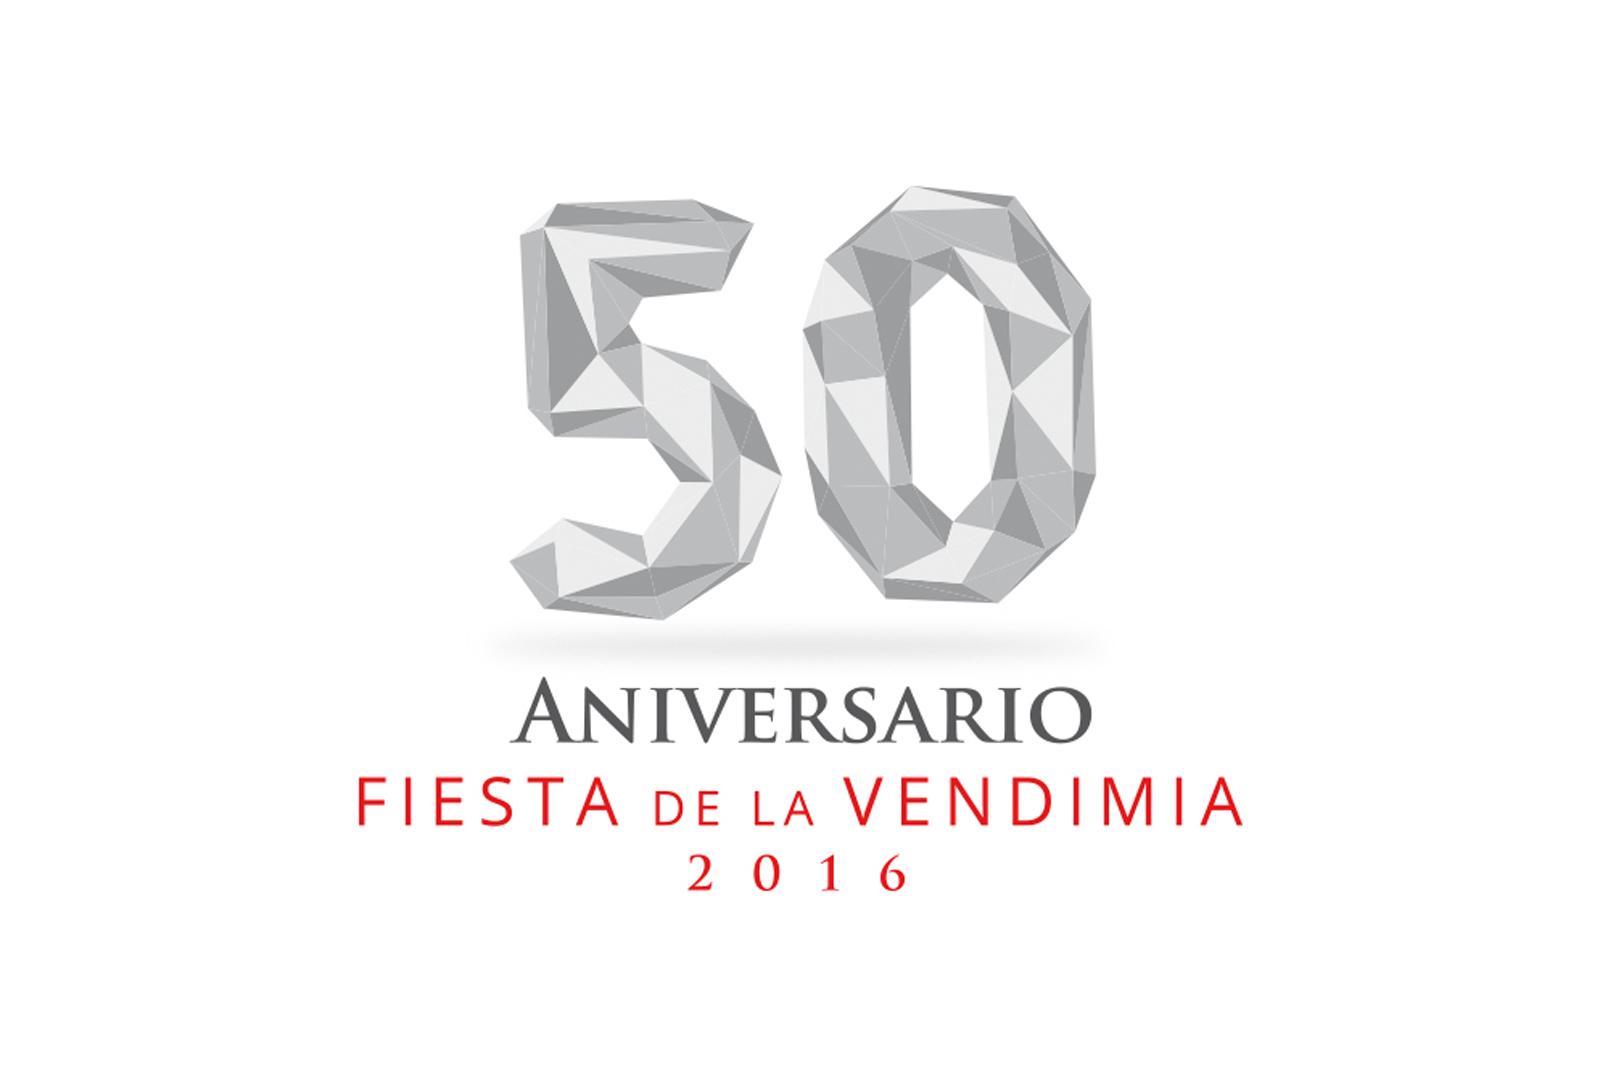 Vendimia Cariñena, declarada de Interés Turístico de Aragón.